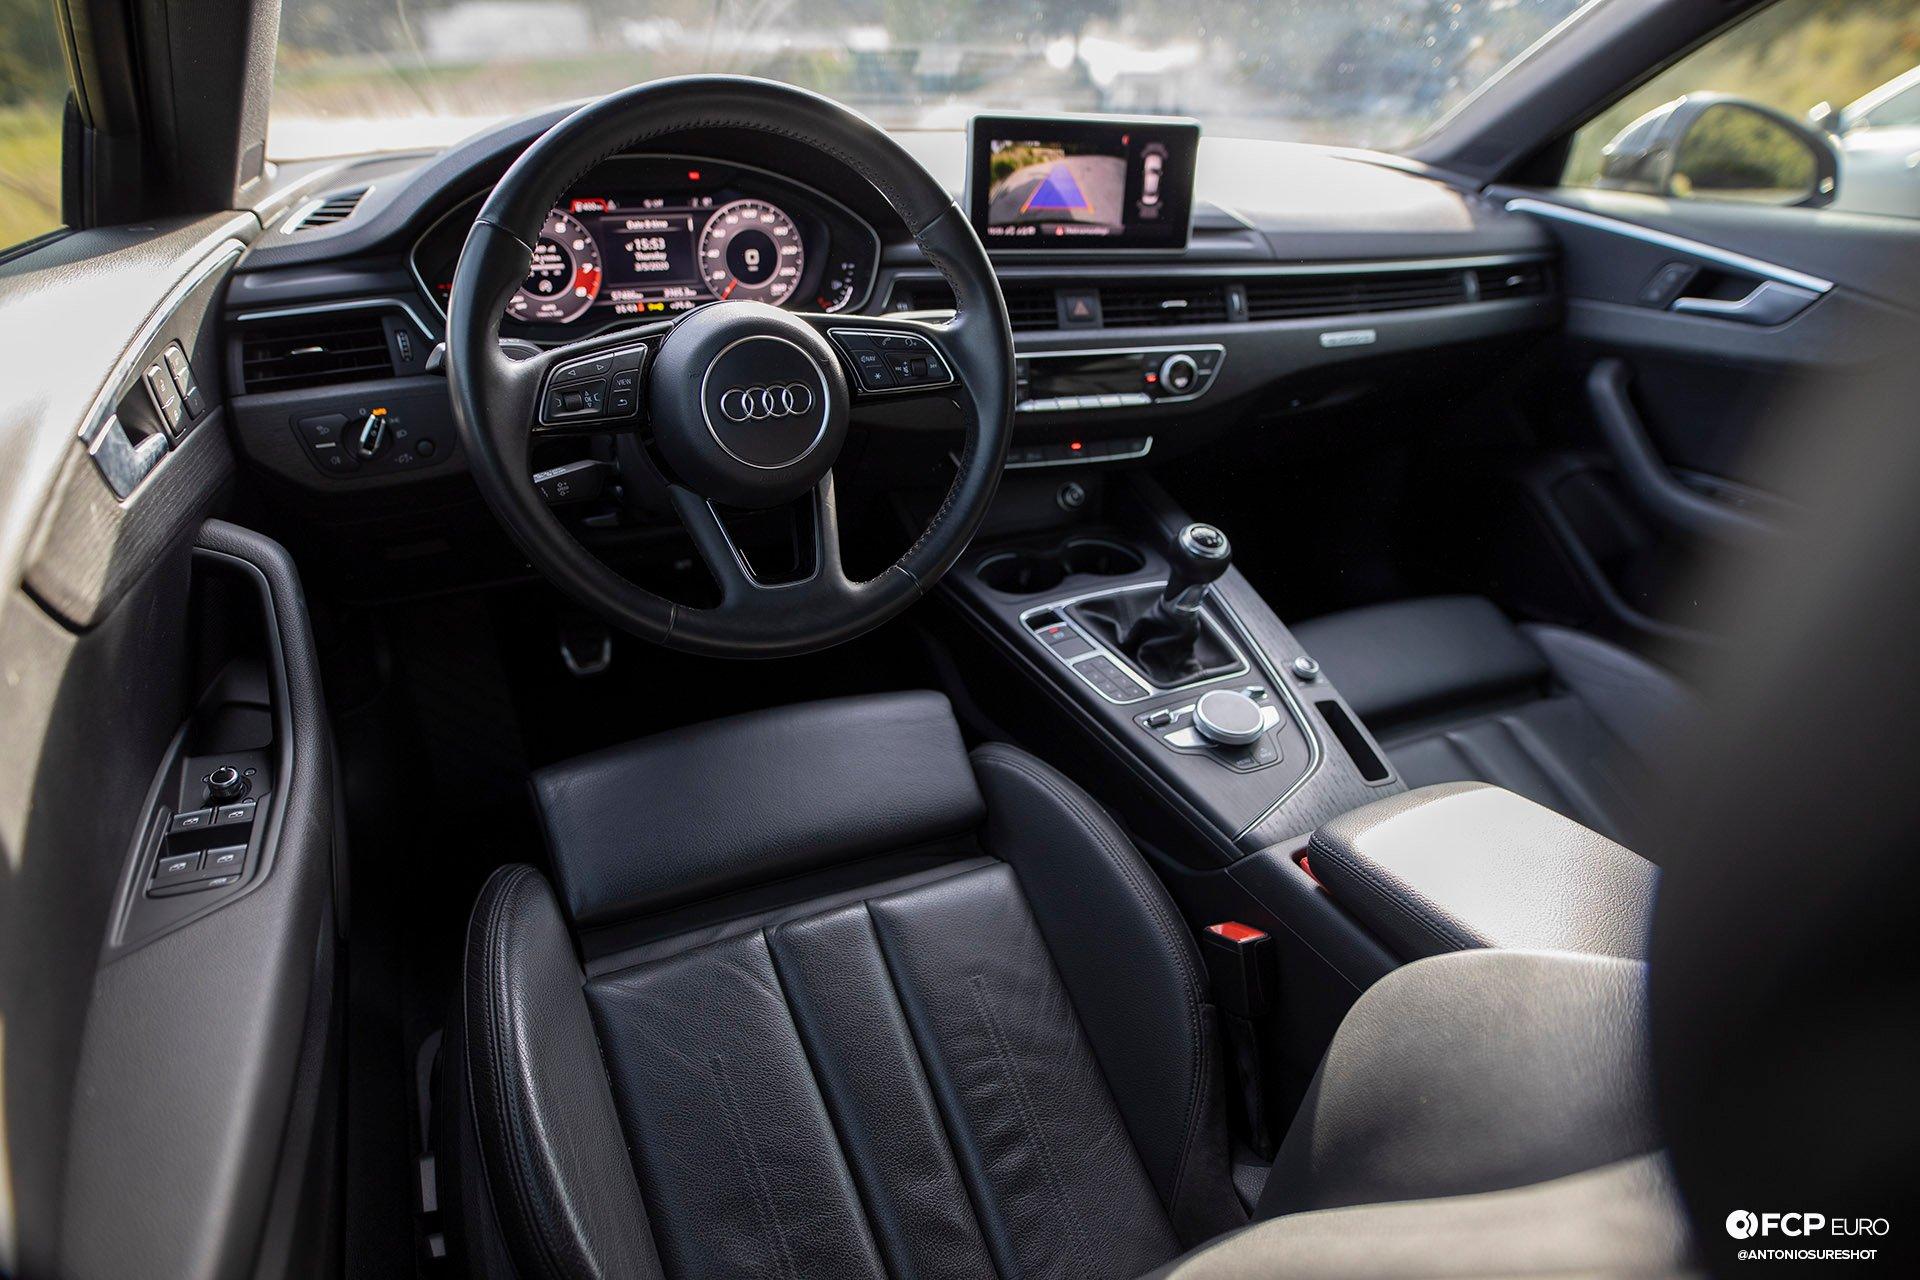 034 Motorsport Moss Motorsport B9 Audi A4 6spd Manual EOSR0849